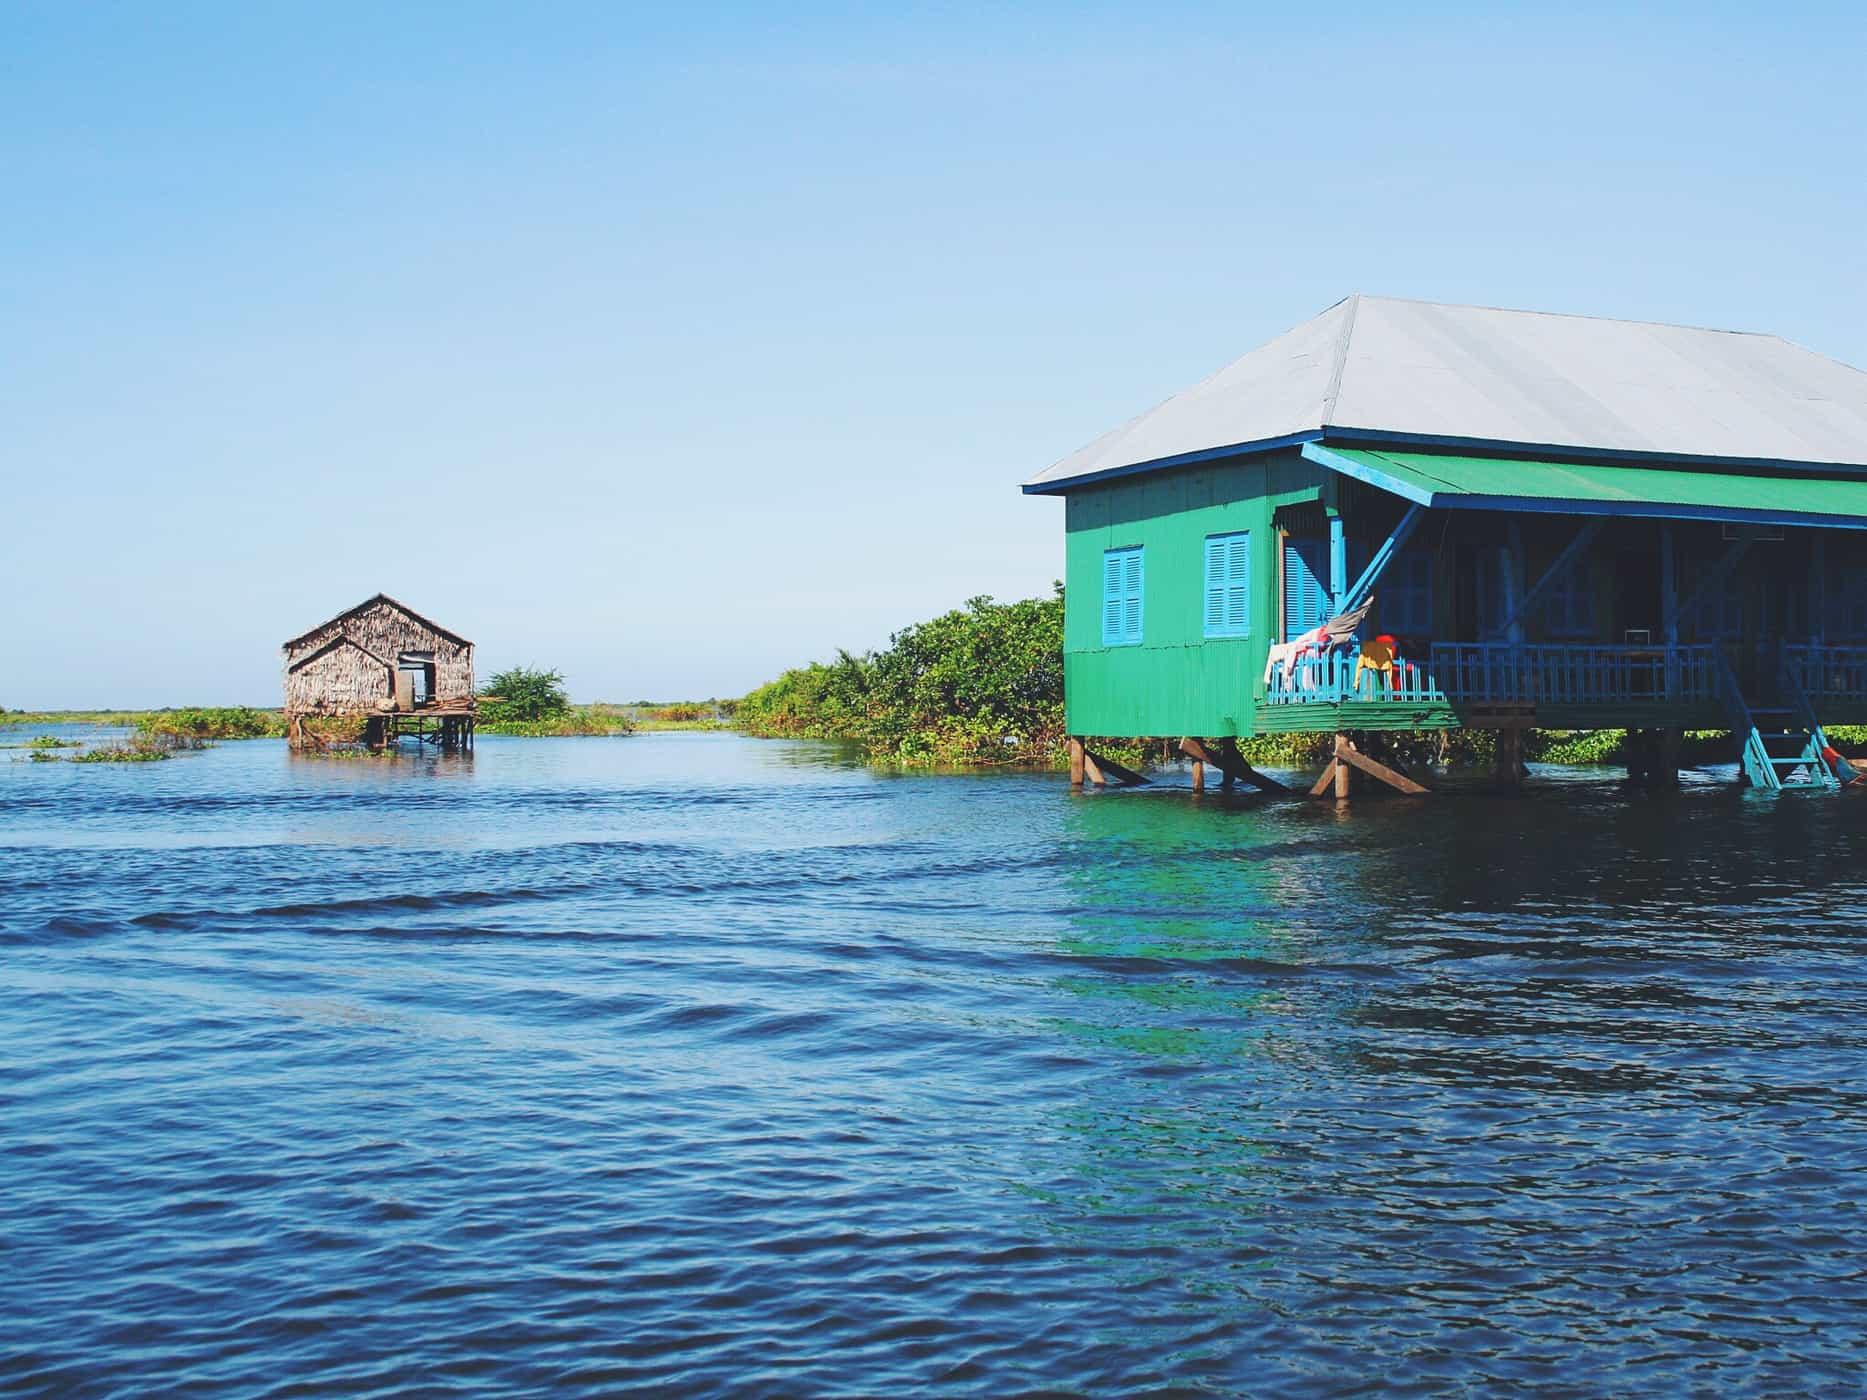 The Tonlé Sap Lake, Cambodia